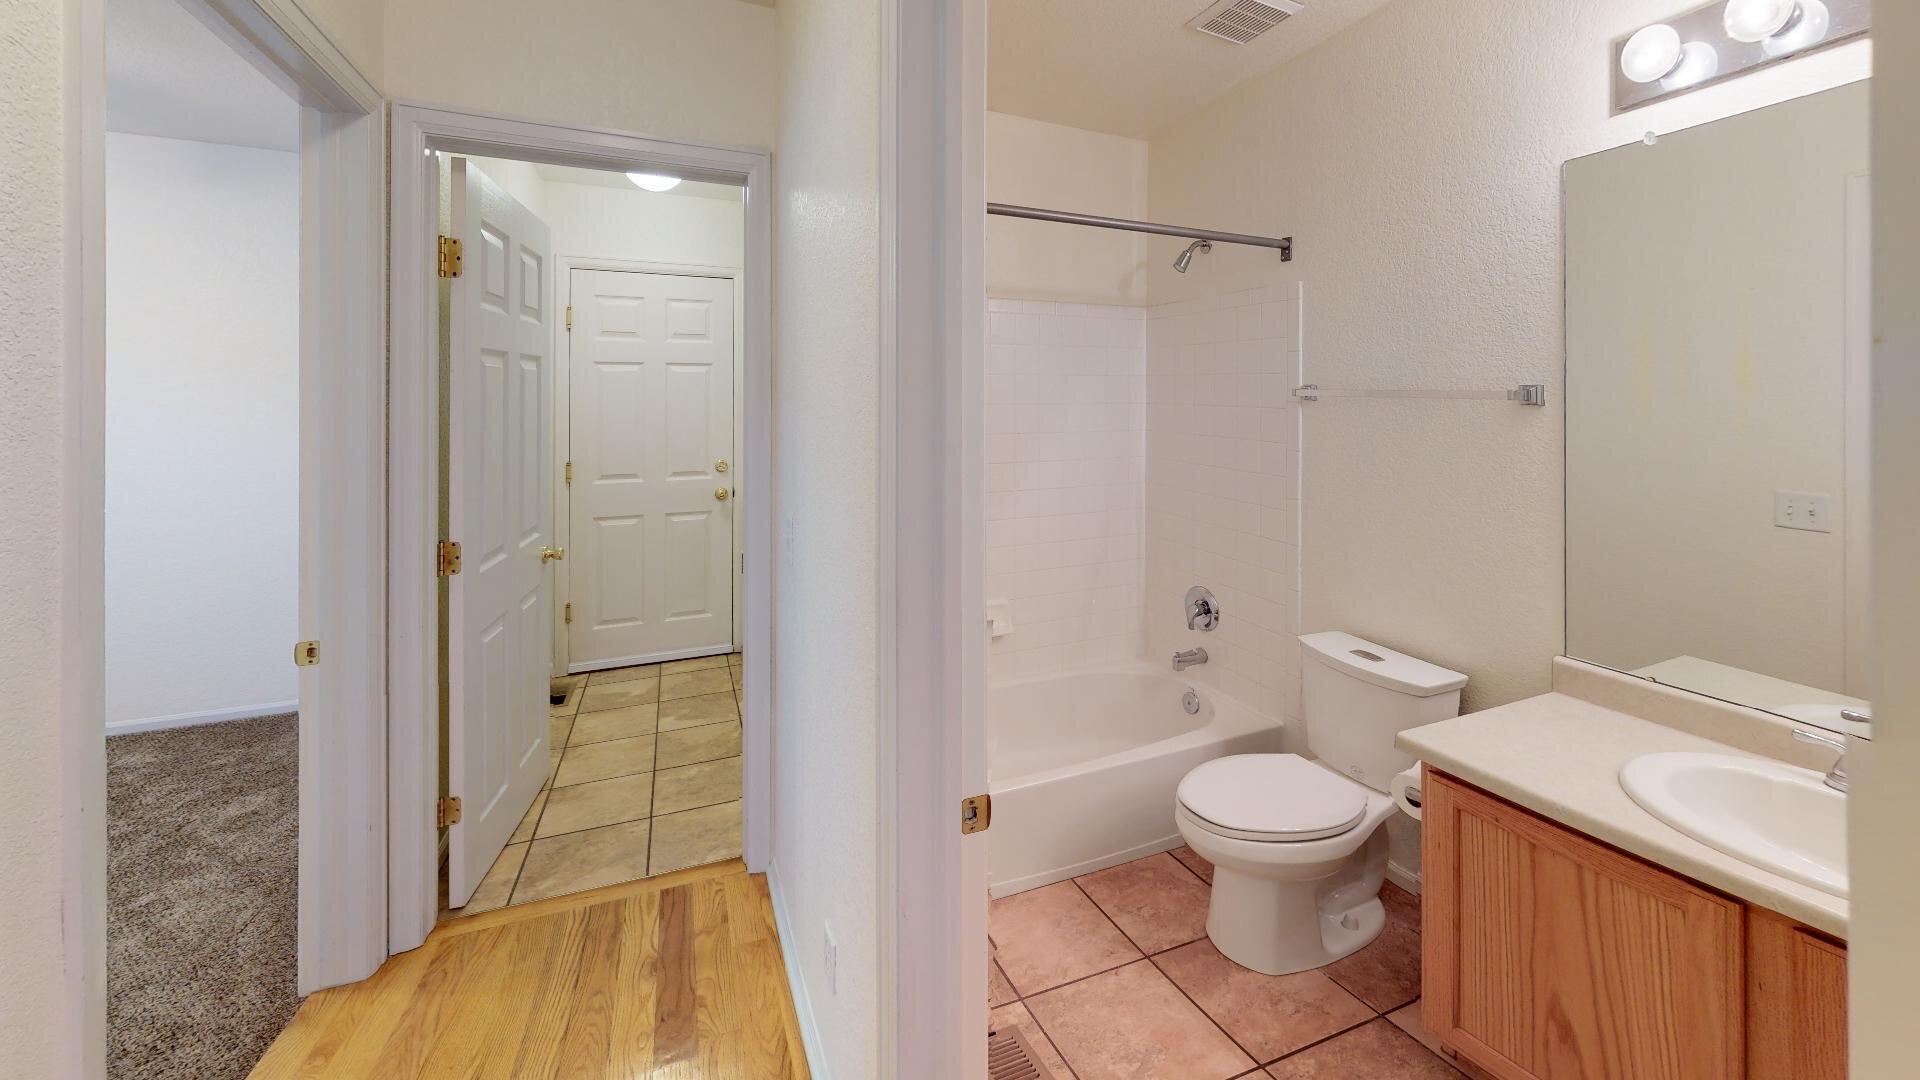 13075-Kearney-St-Bathroom(1).jpg